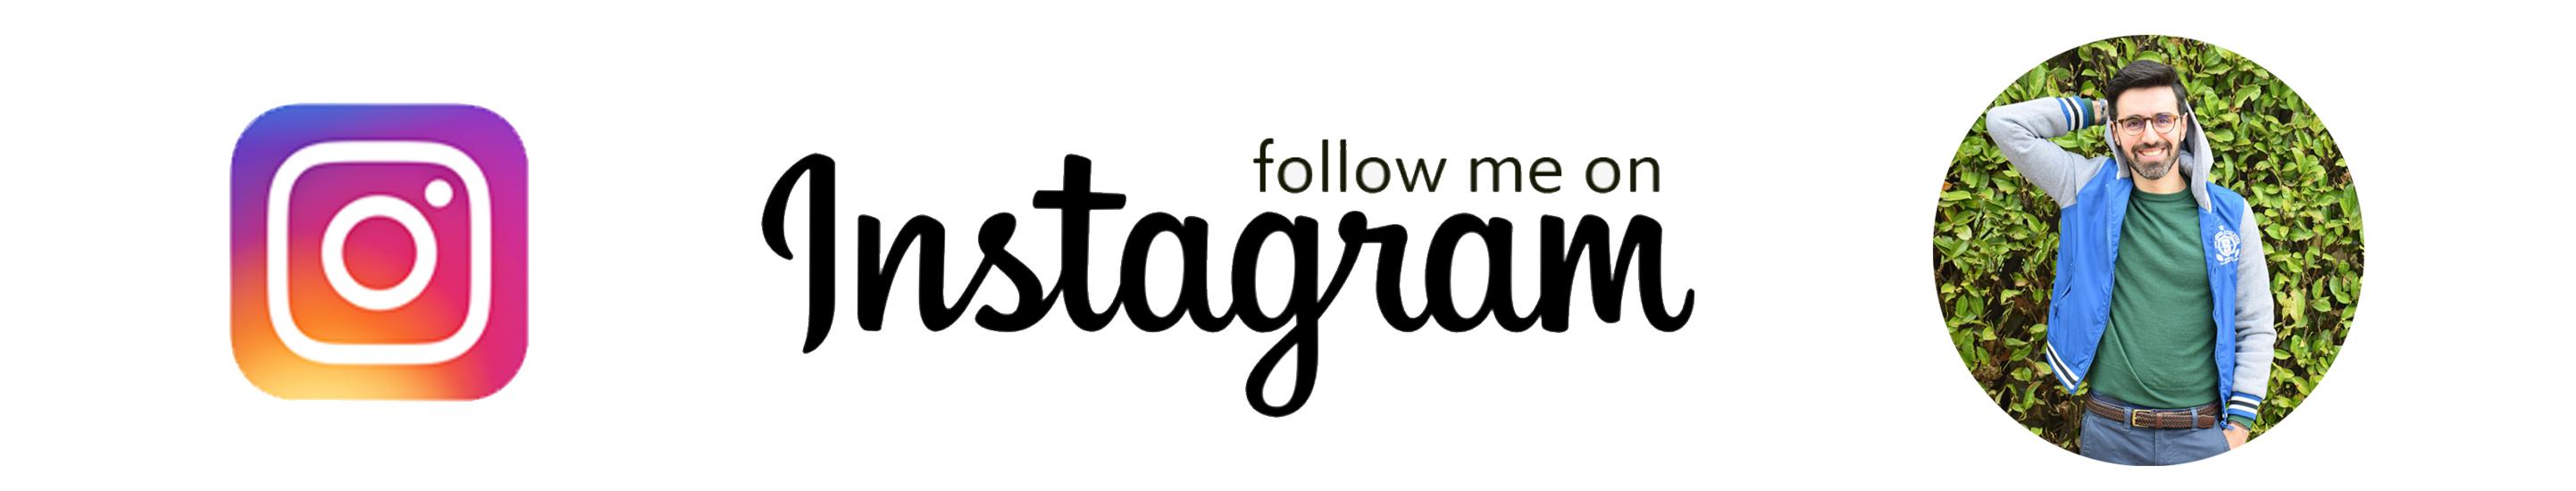 Follow me on istagram